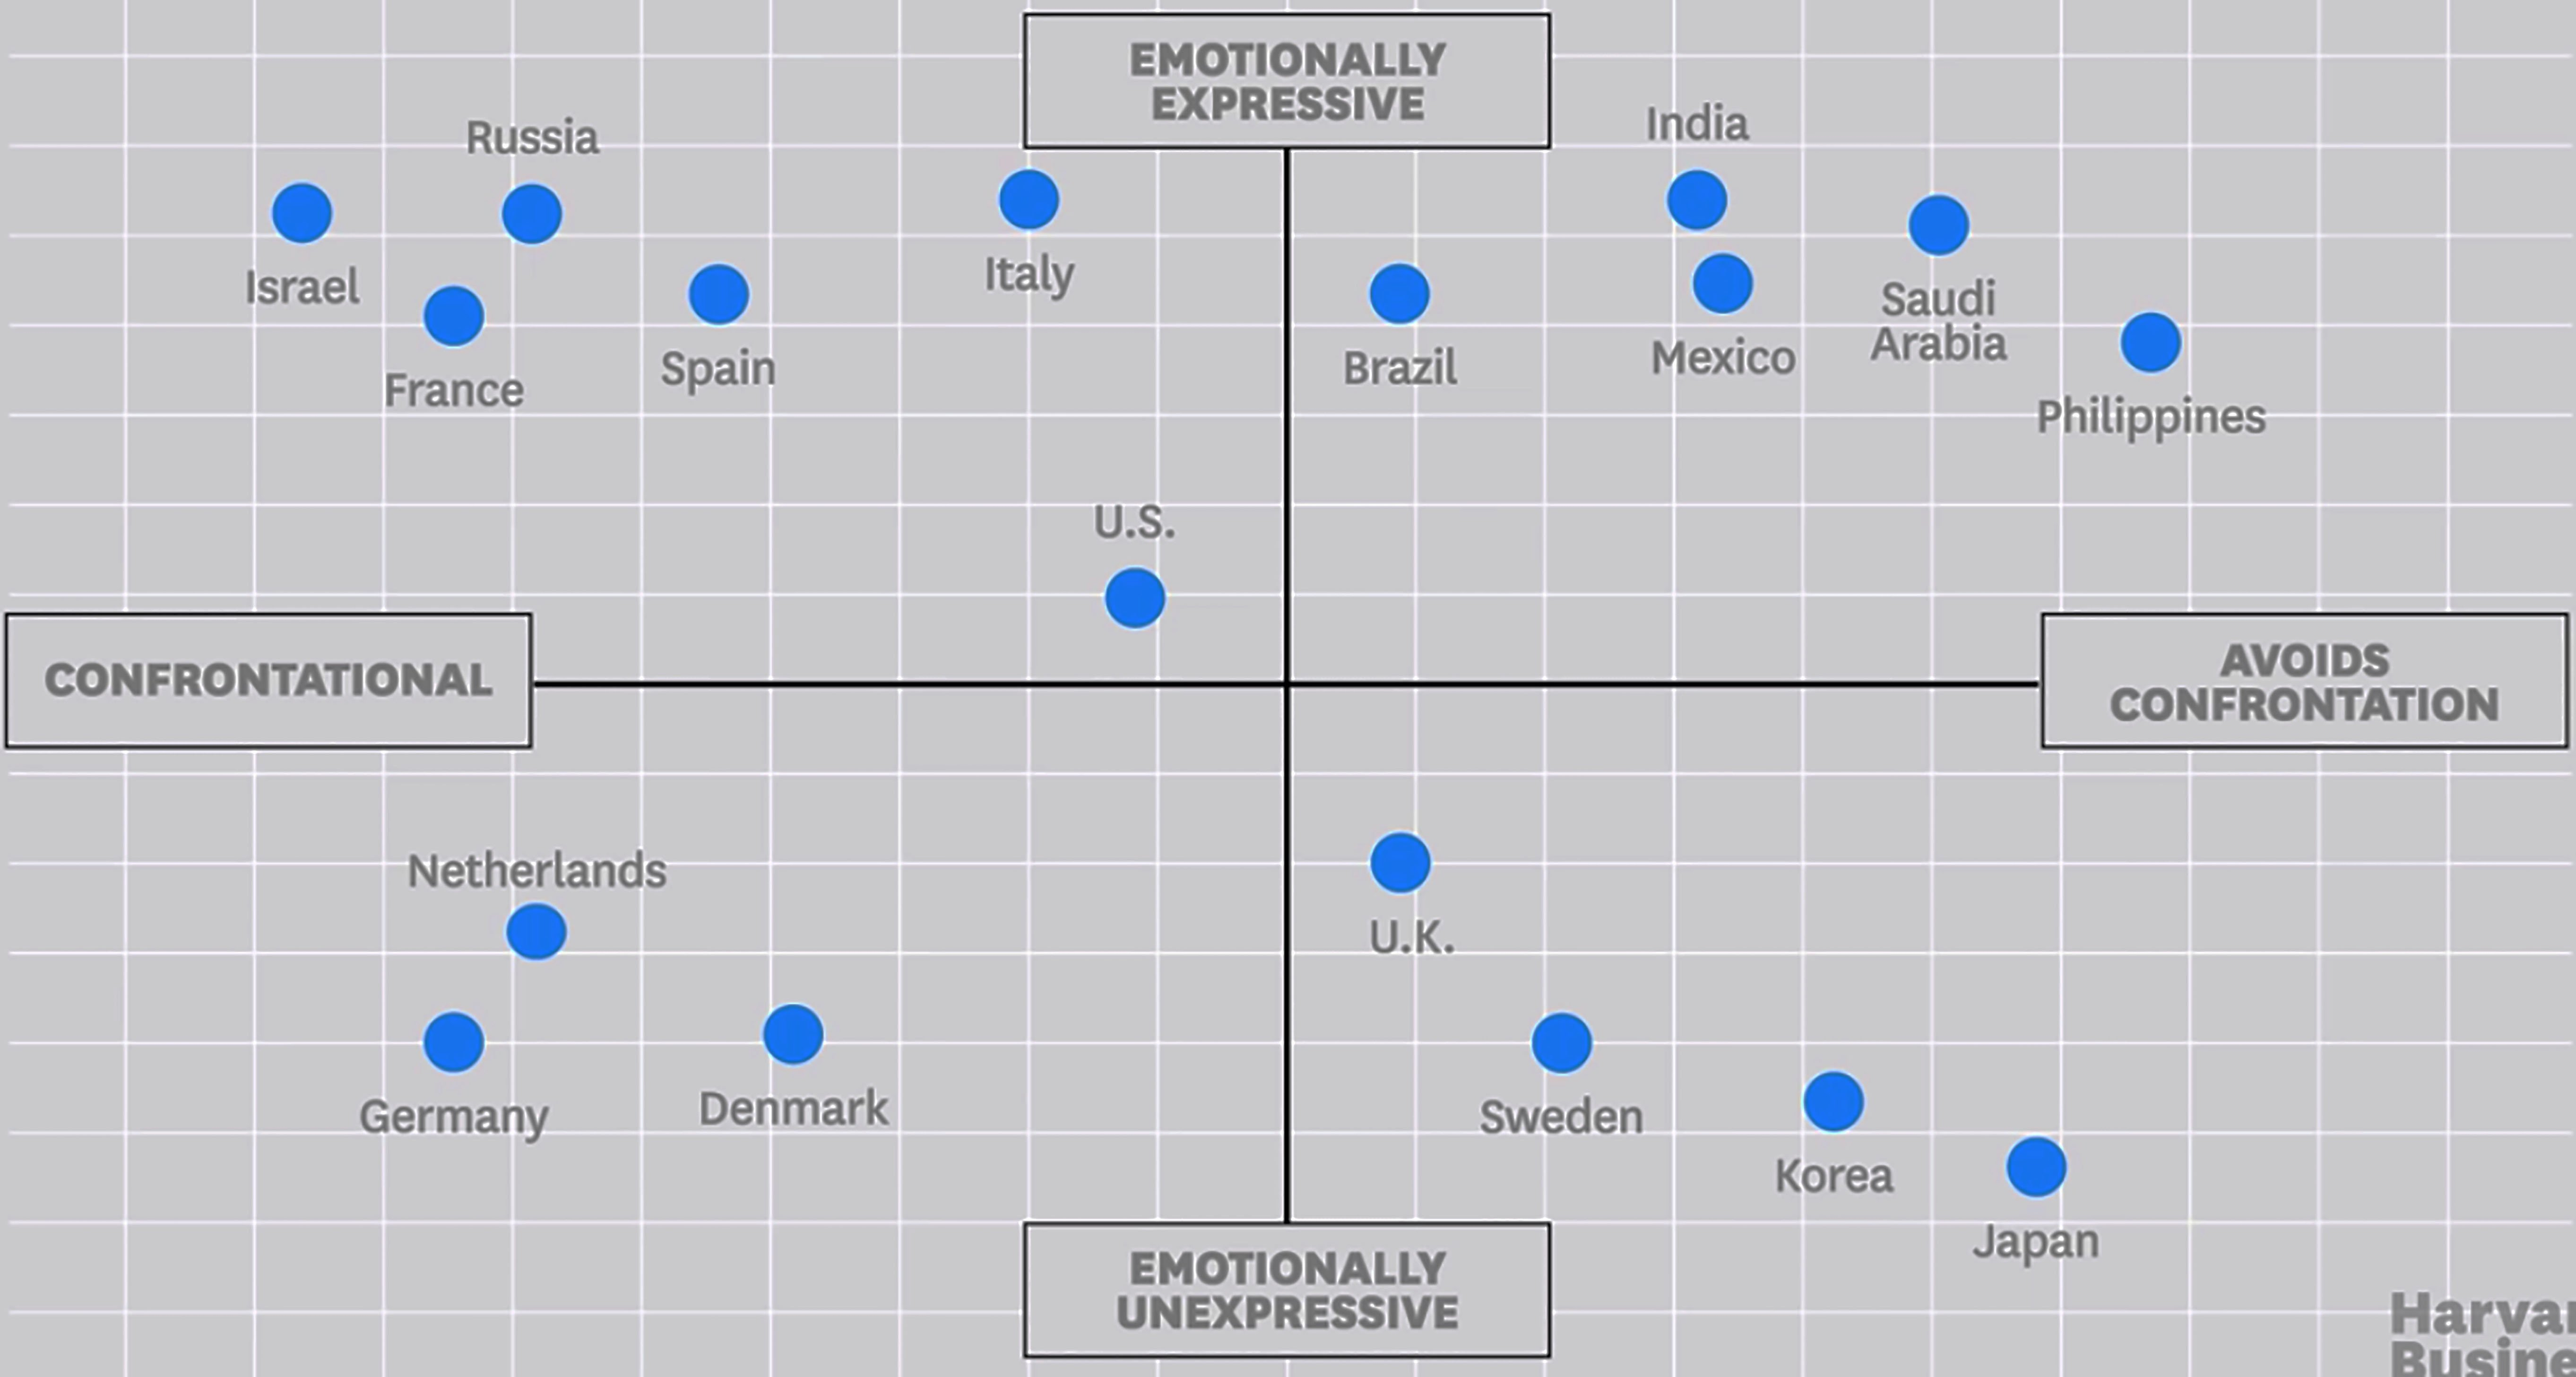 full_image_cultural_emotions.jpg